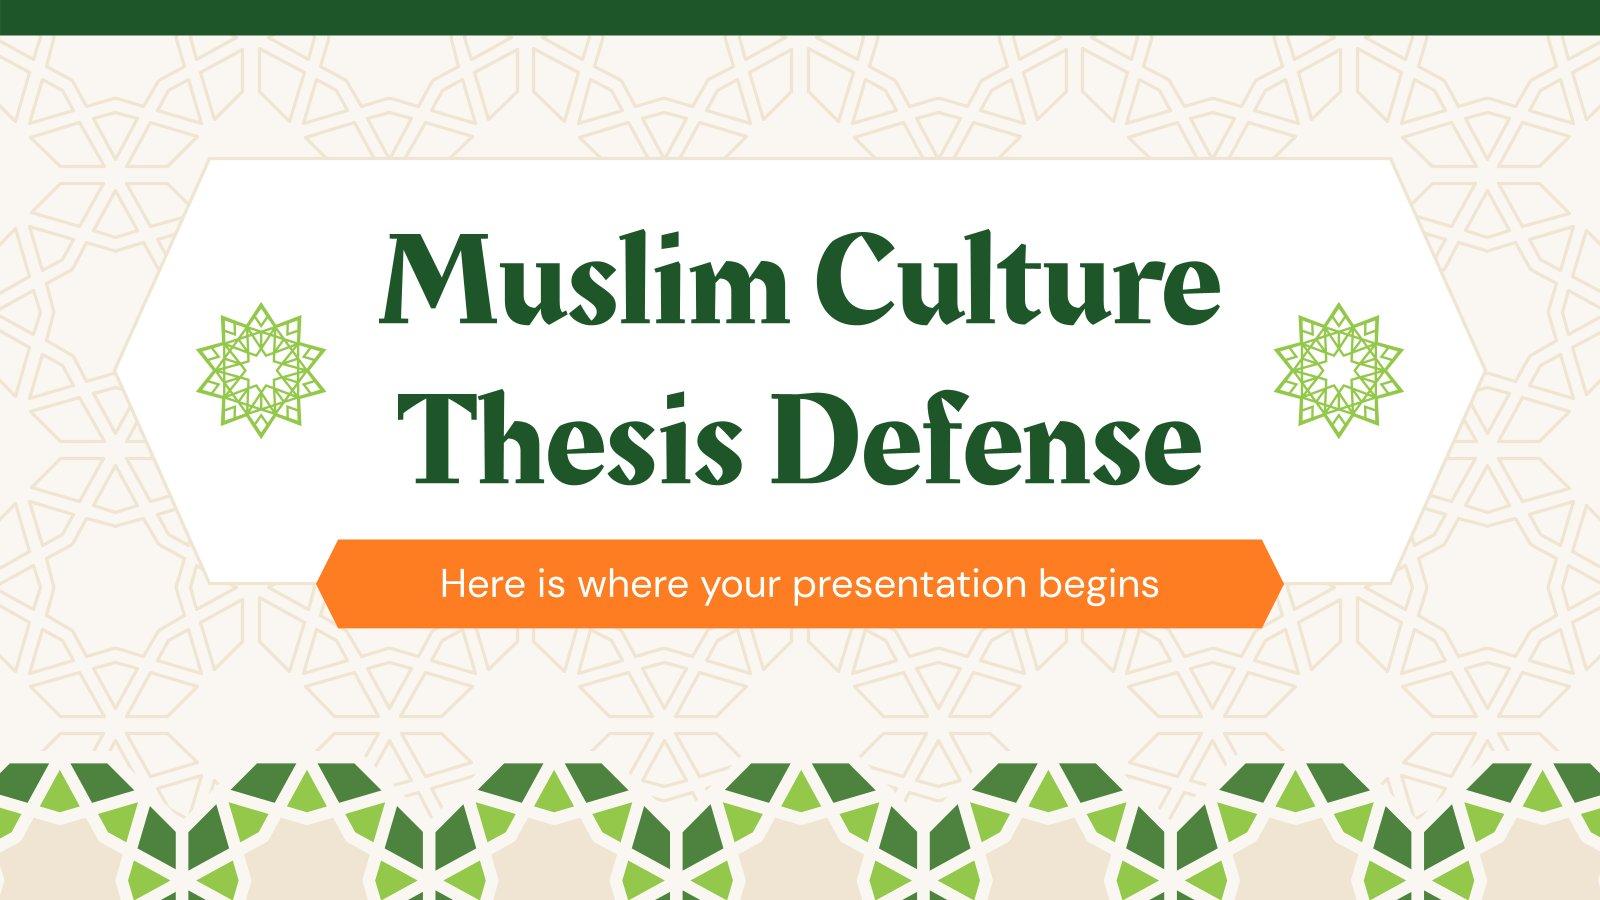 Muslim Culture Thesis Defense presentation template